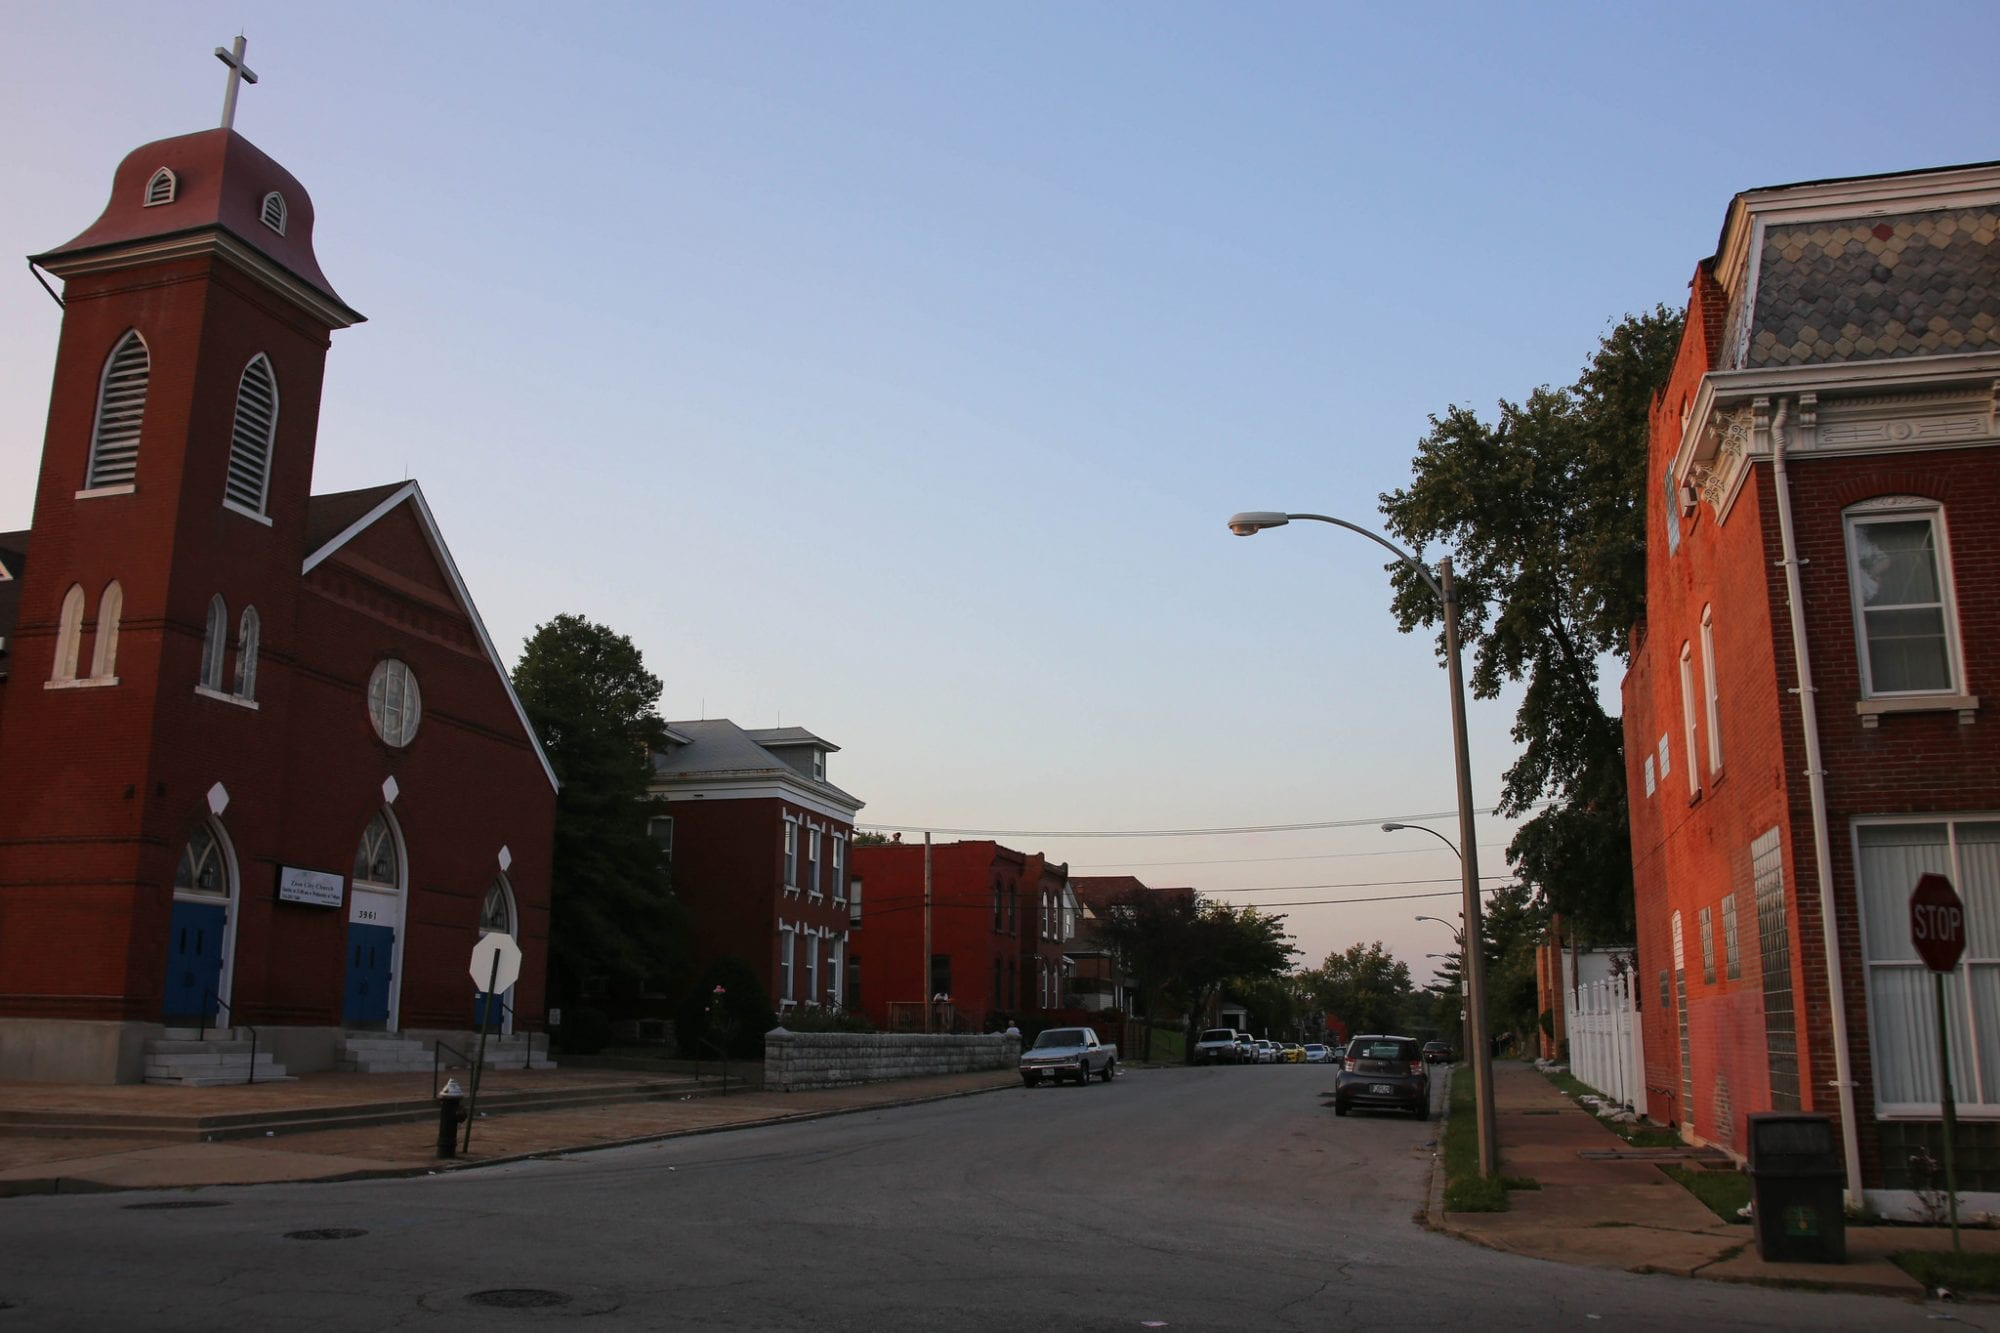 Share Your Dutchtown Photos!